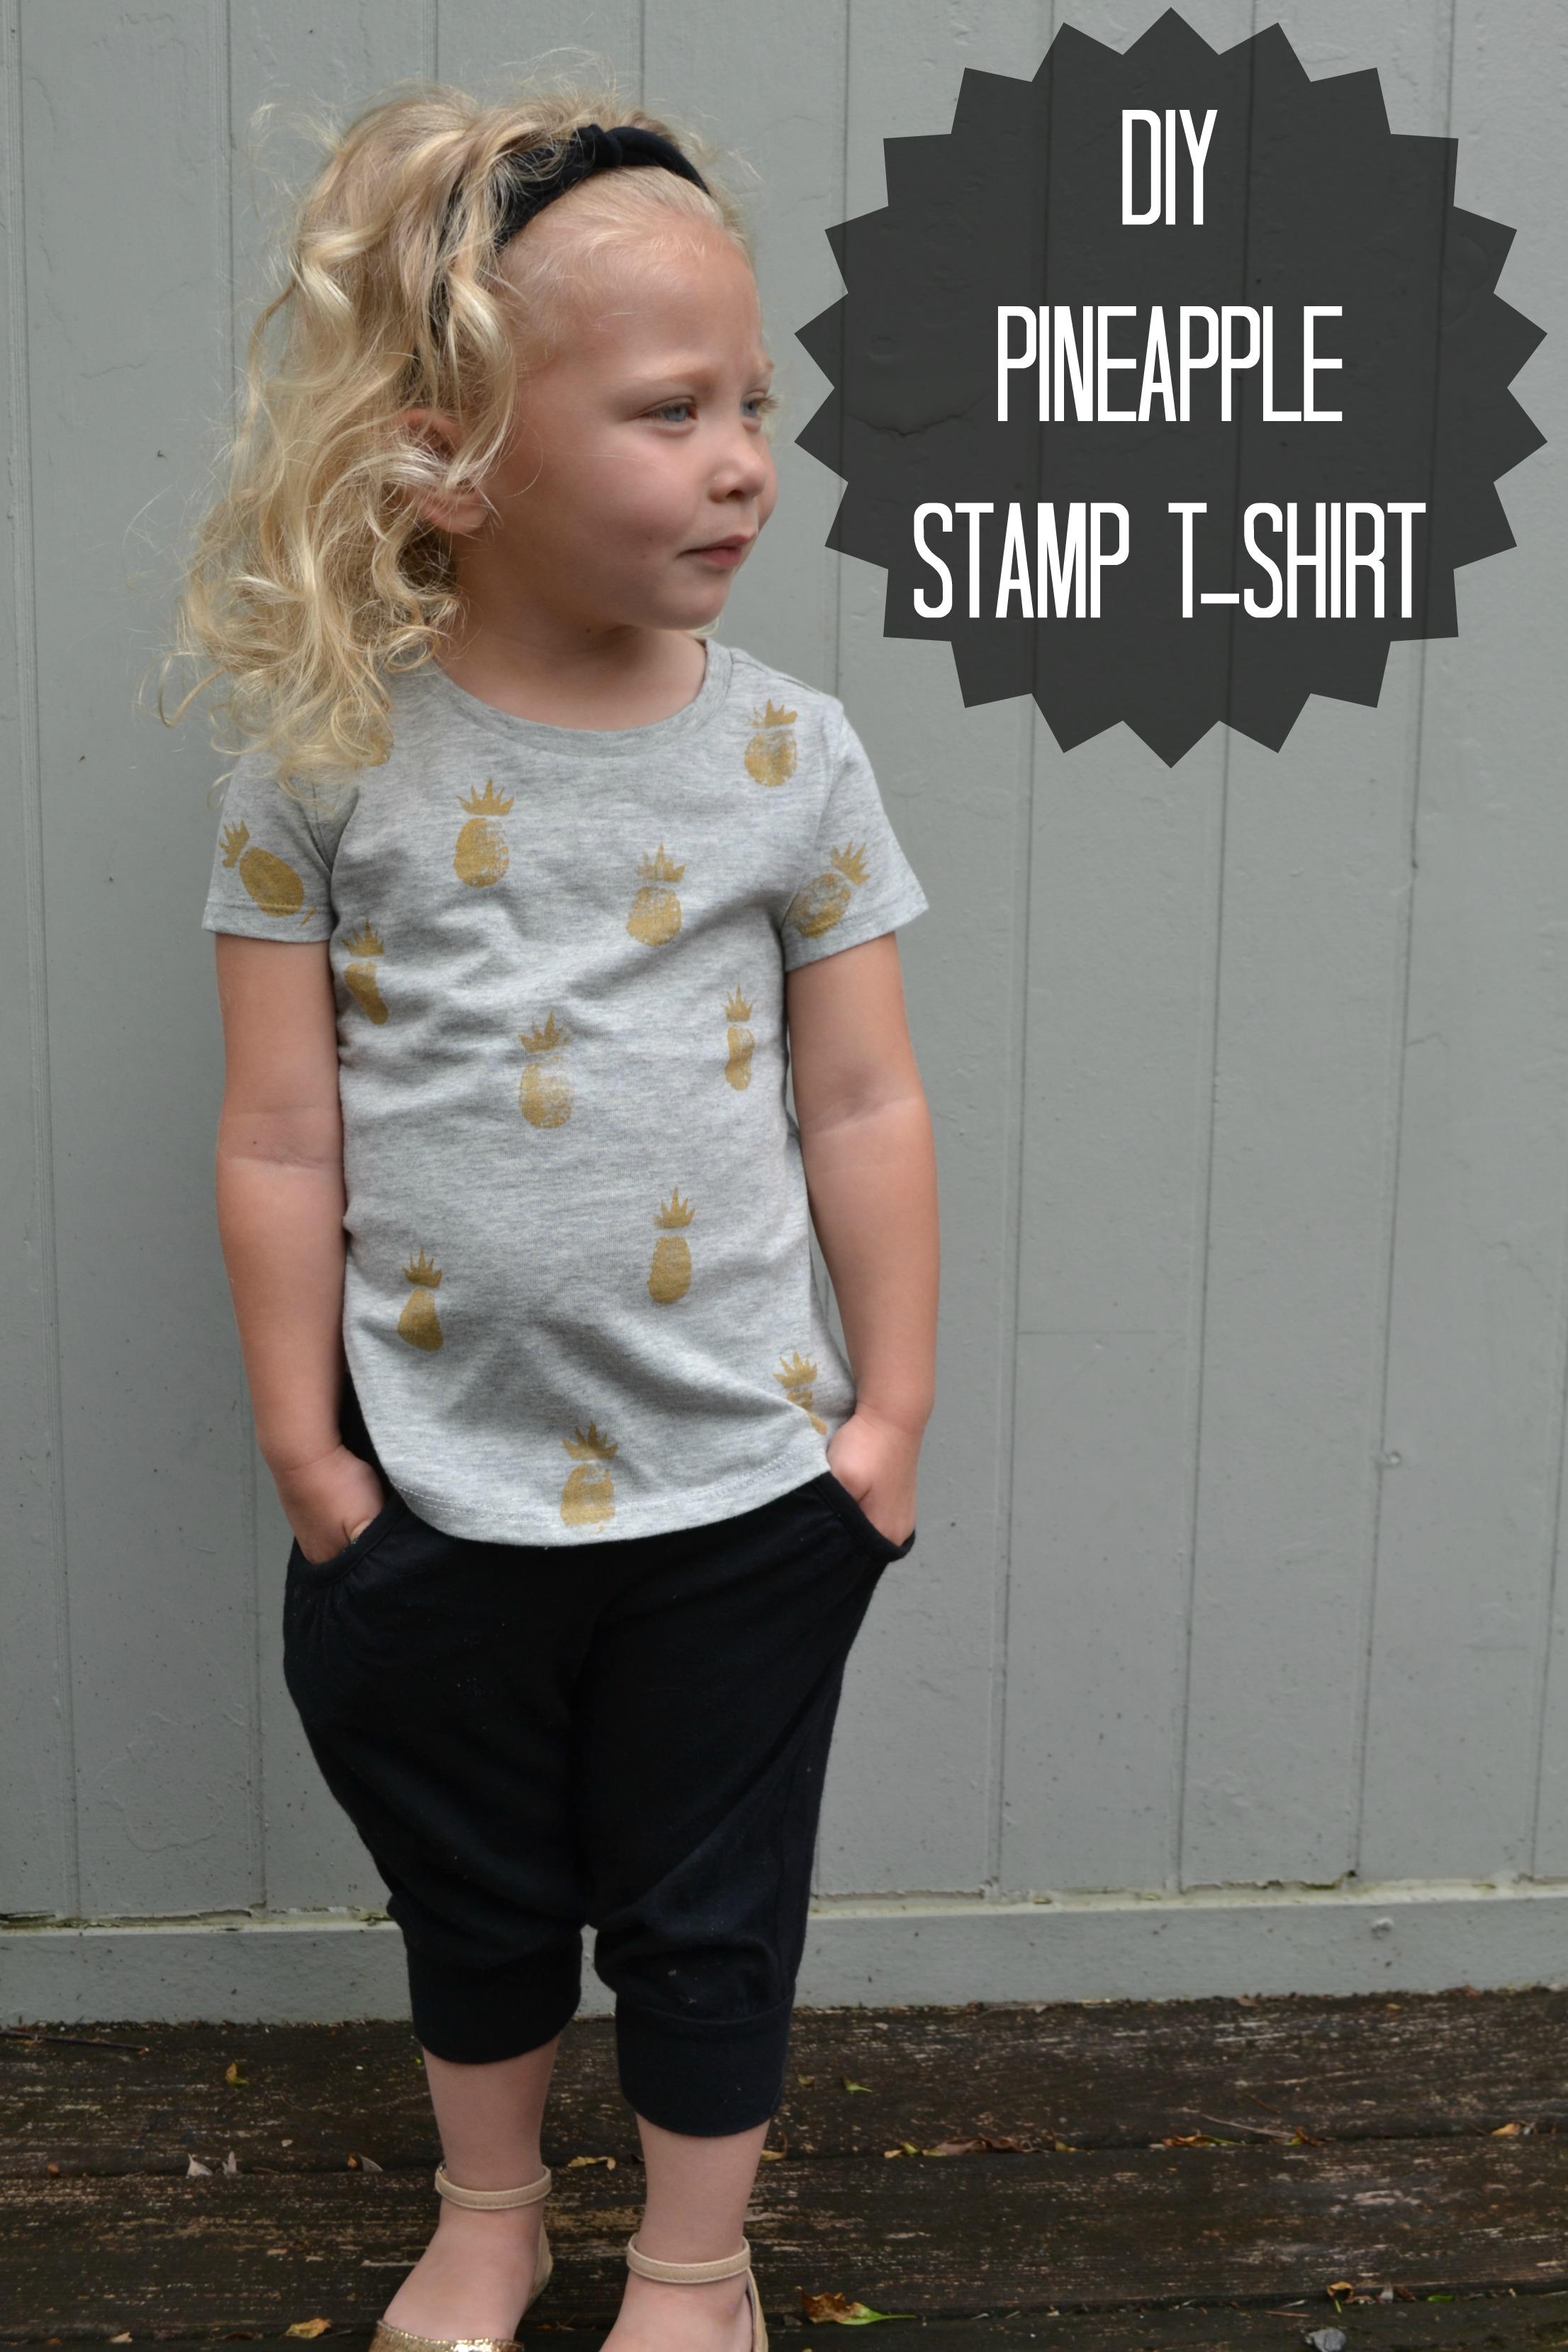 DIY Pineapple Stamp T-shirt